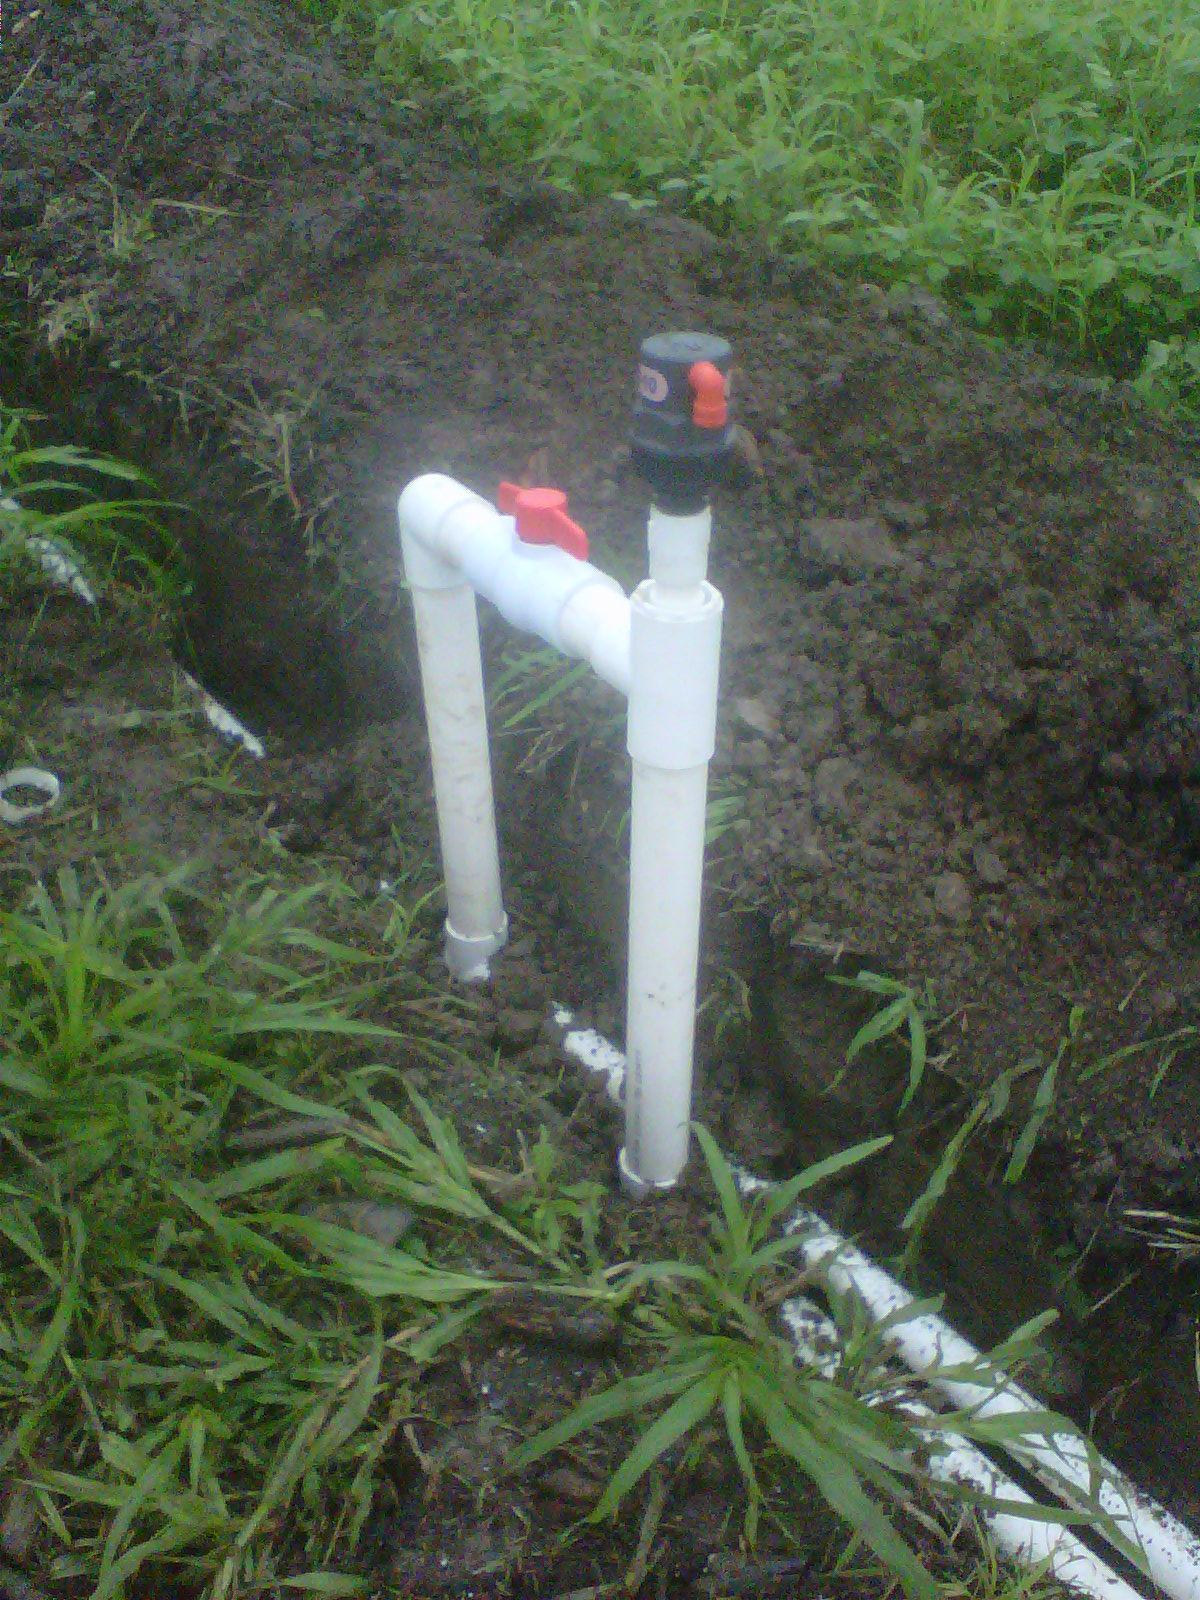 Bombas y riegos de guatemala sistema de riego por goteo y - Sistema riego goteo ...